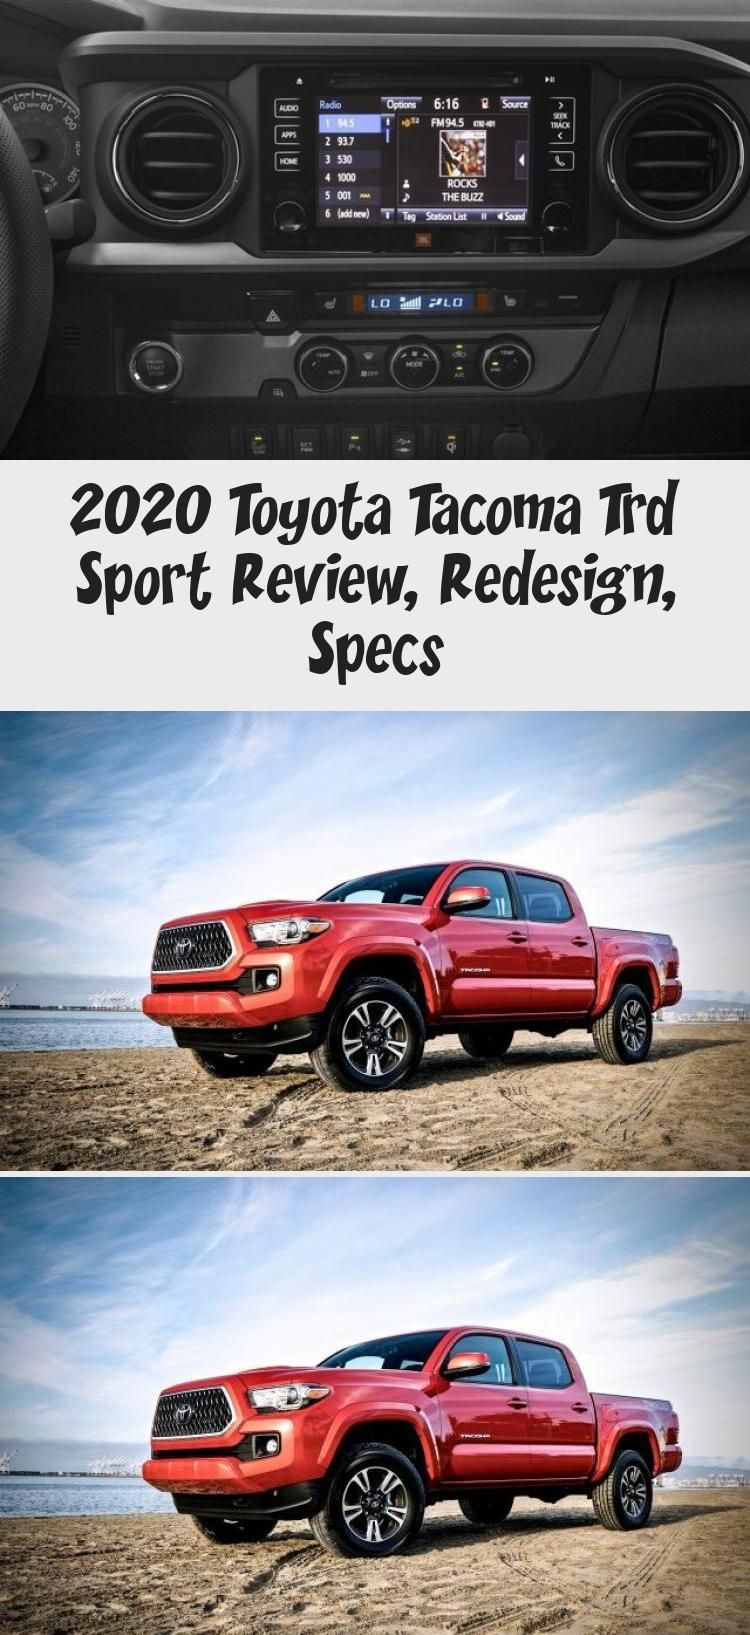 2020 Toyota Trd Sport Review, Redesign, Specs